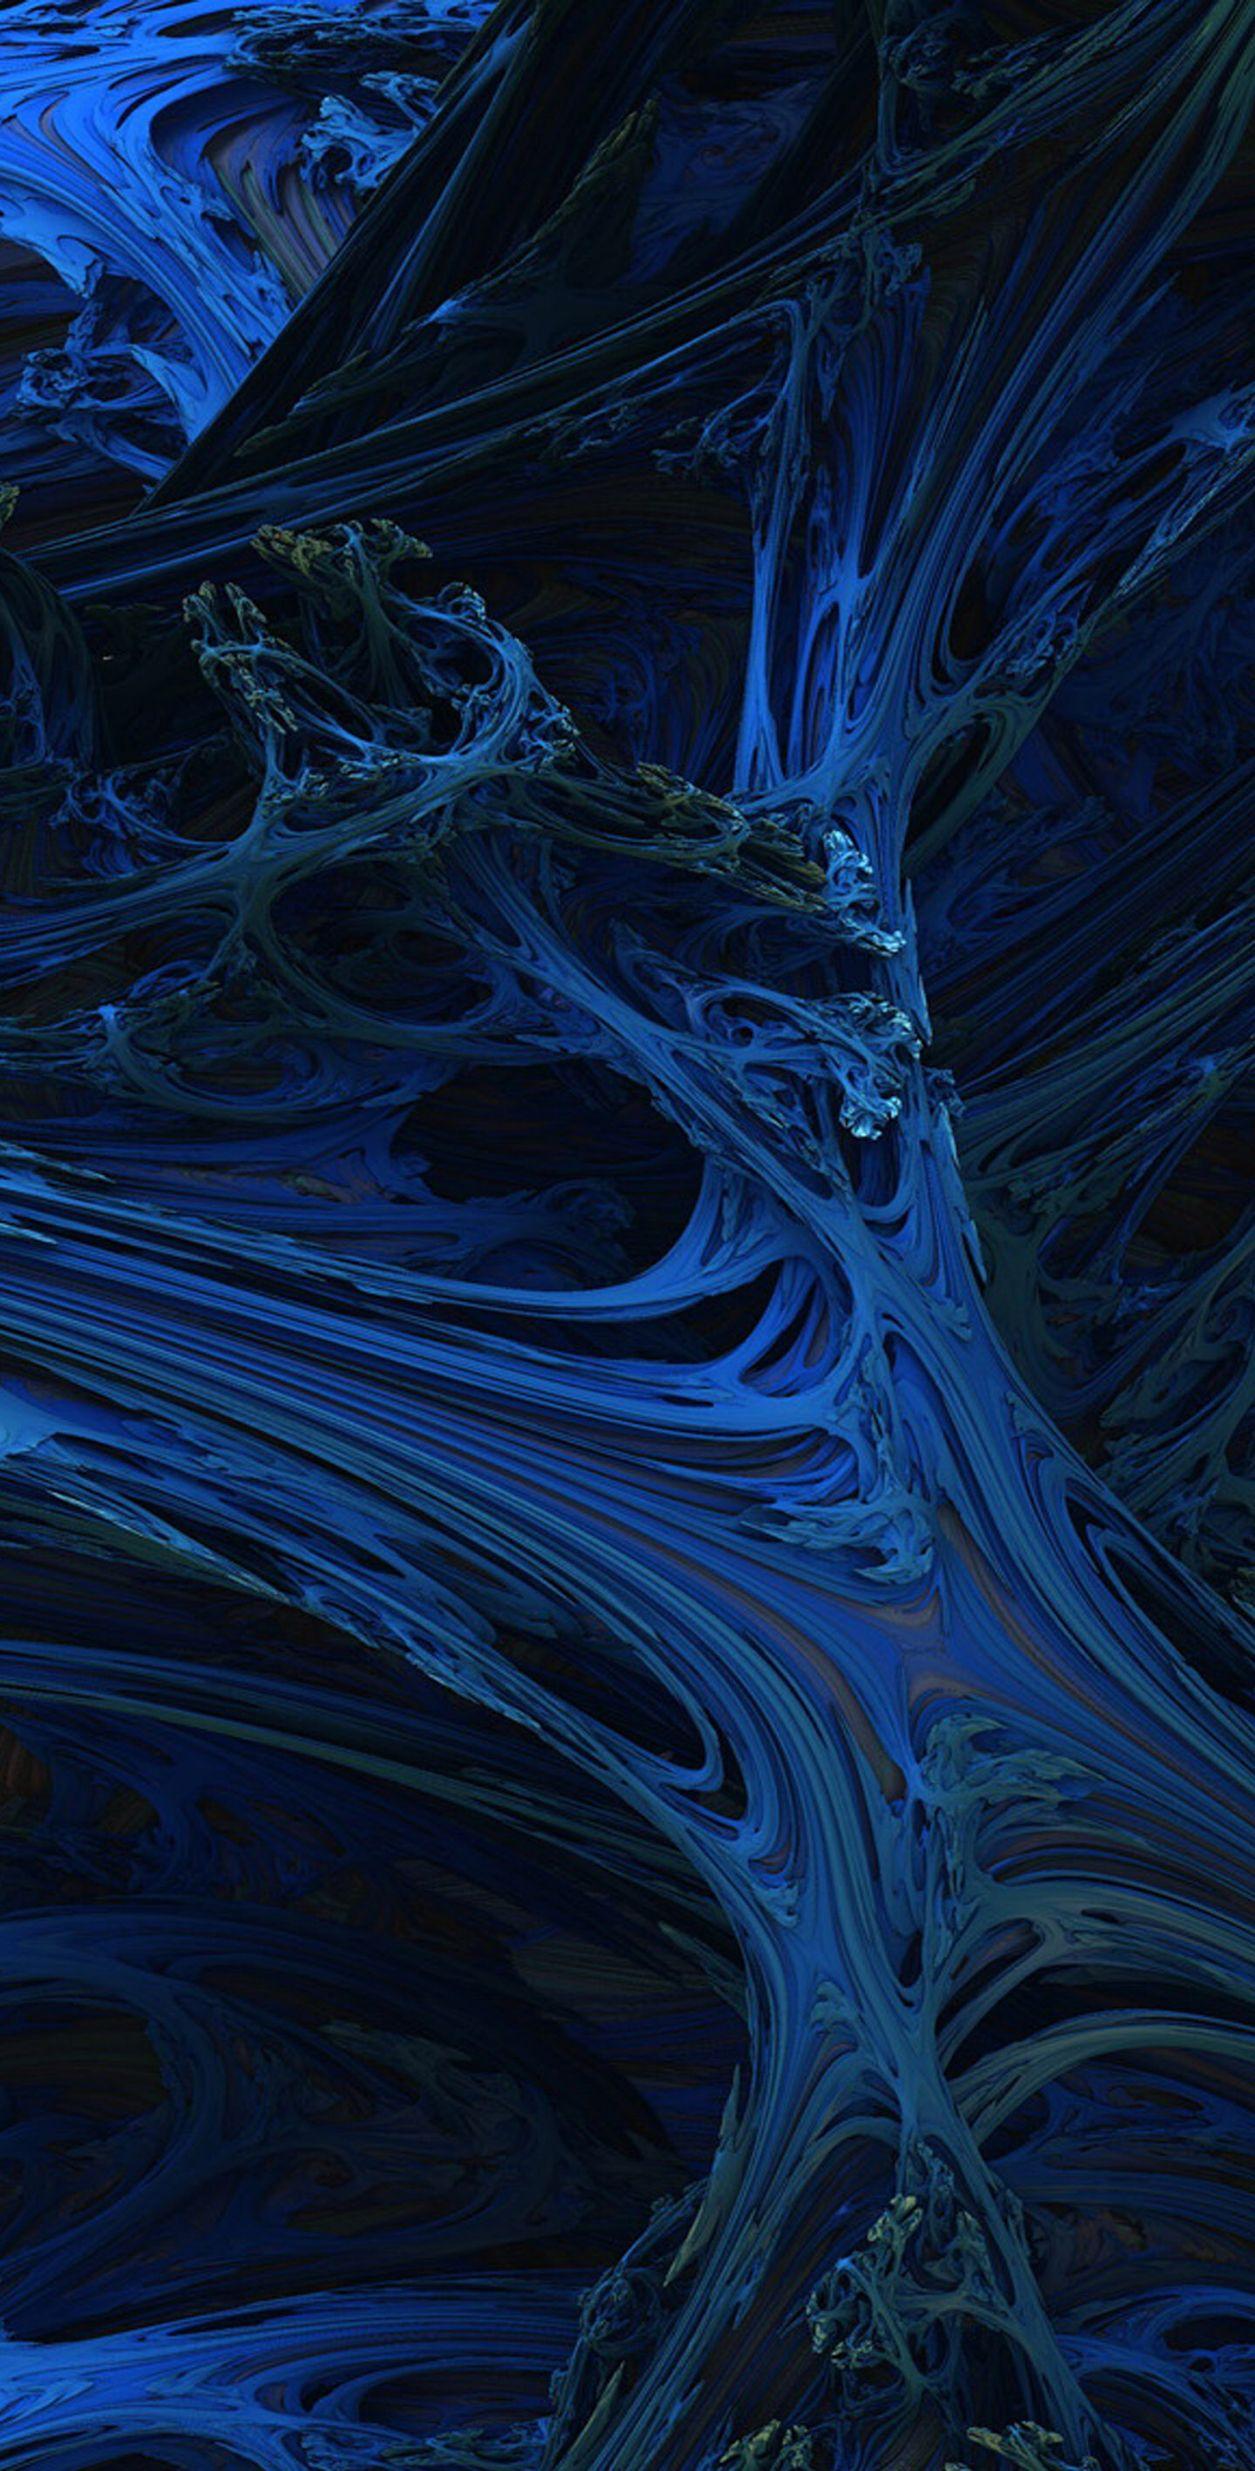 Dark Blue Aesthetic - HD Wallpaper